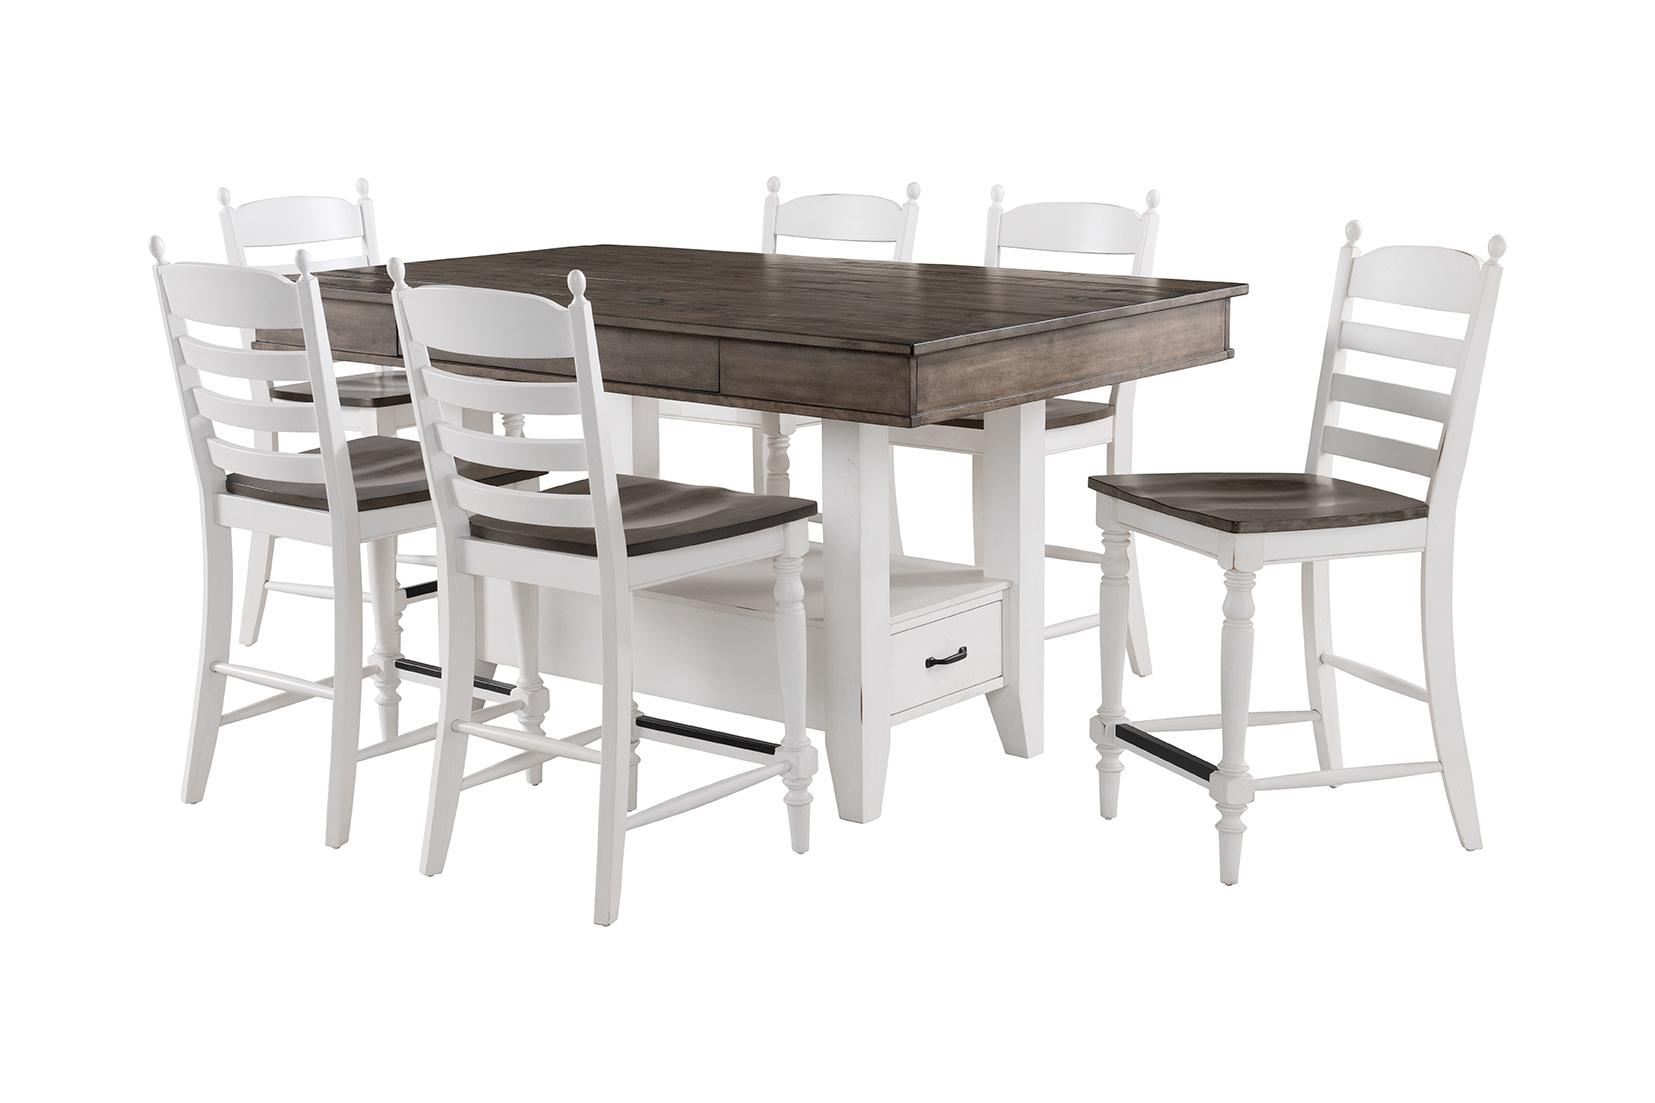 Belgium Farmhouse Counter Table W Drawers Intercon Furniture